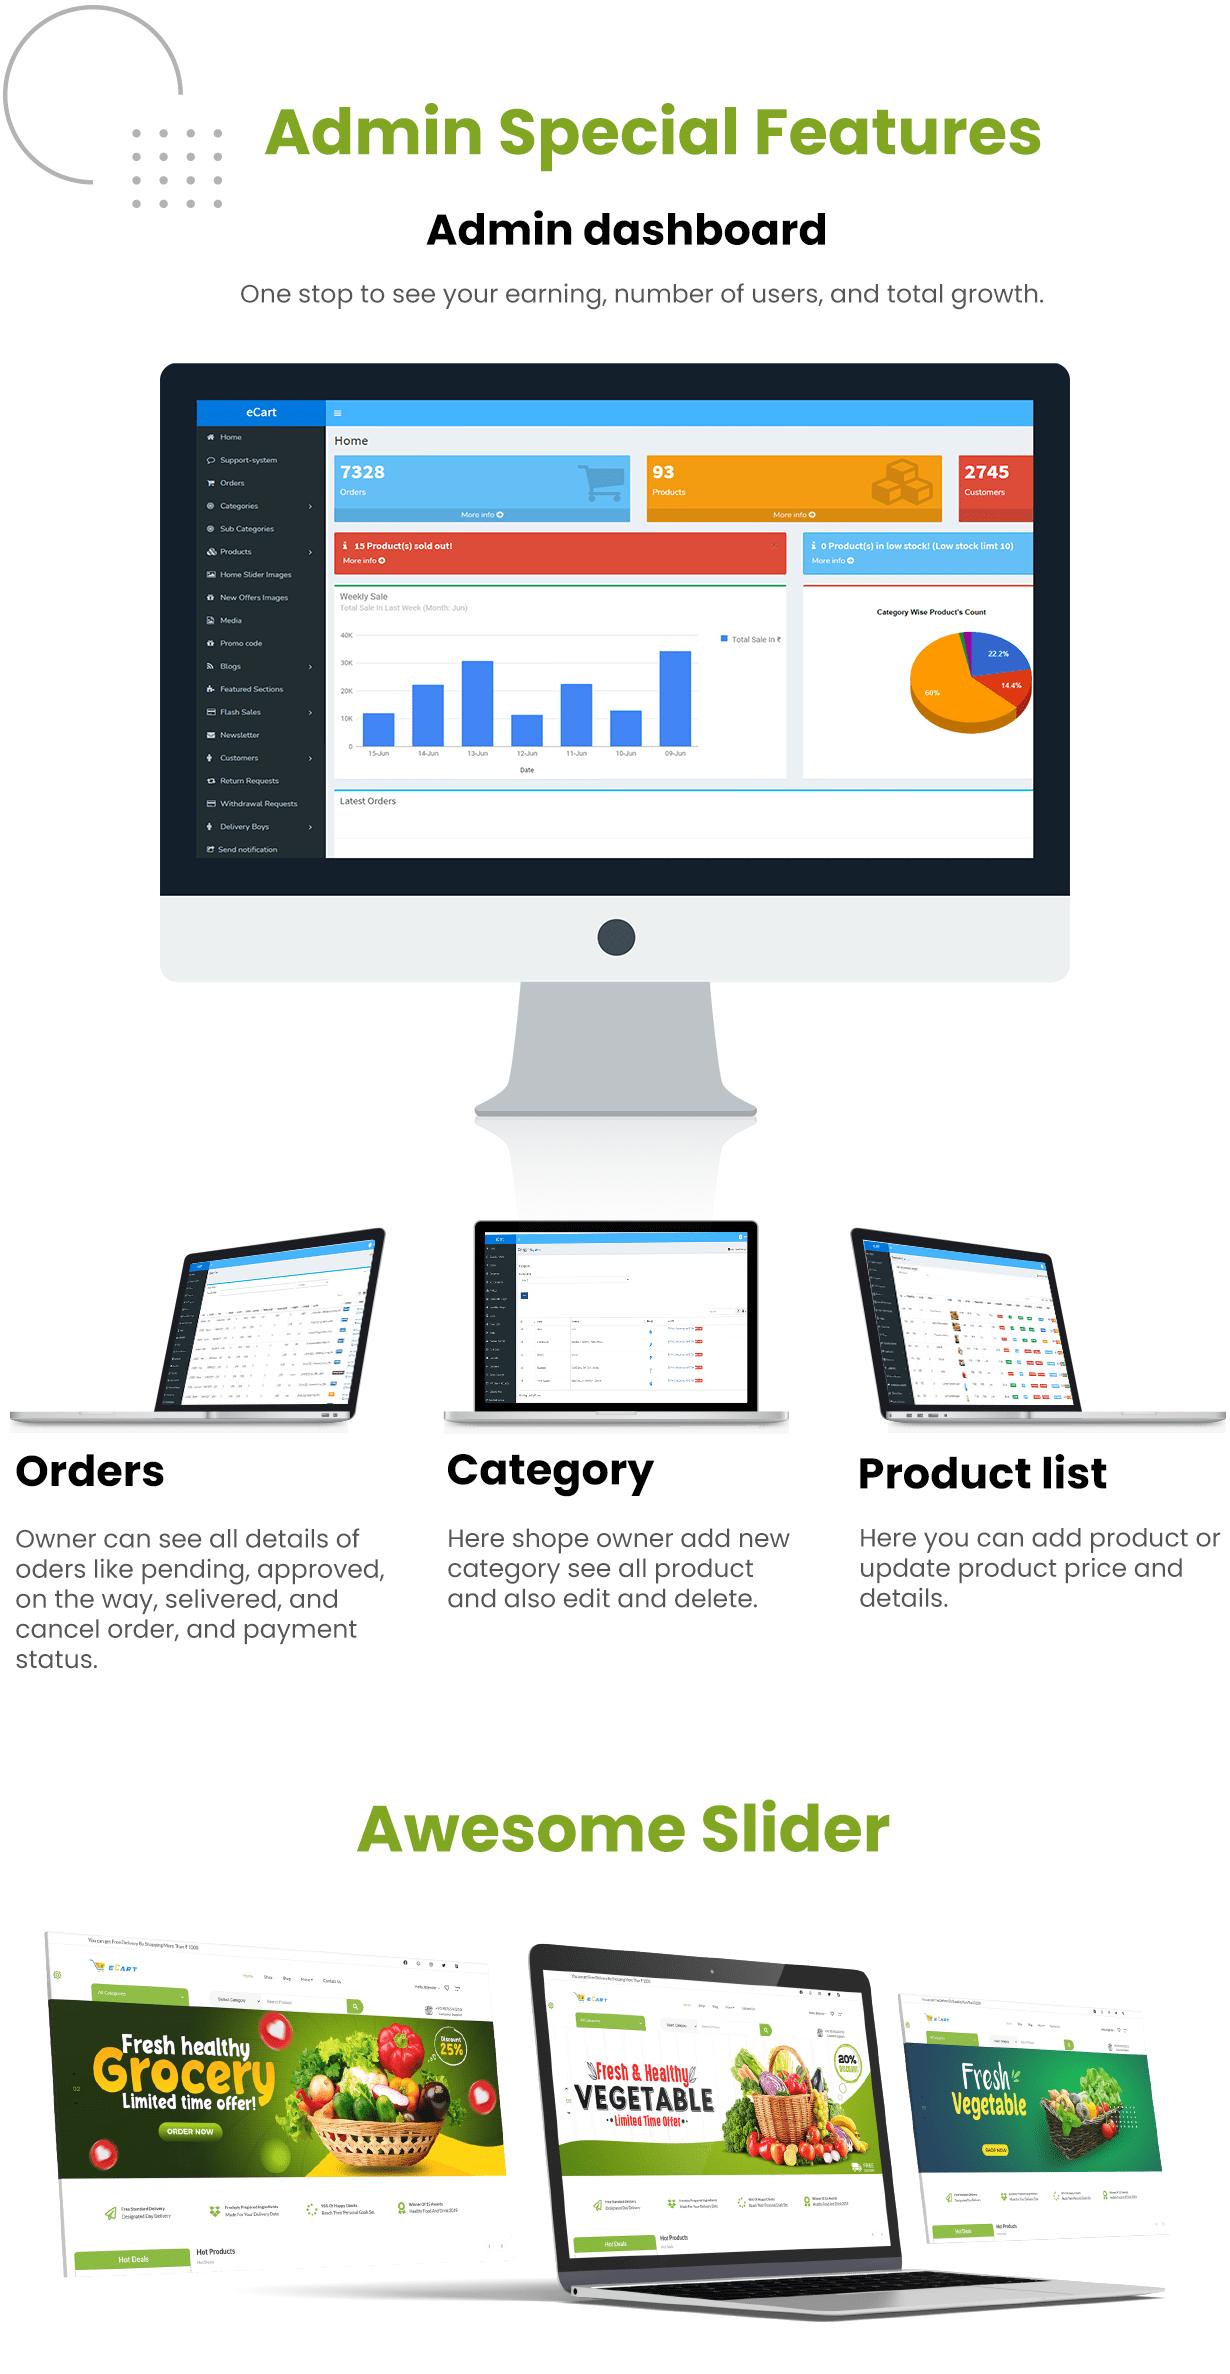 eCart Web - Ecommerce / Store Full Website - 8